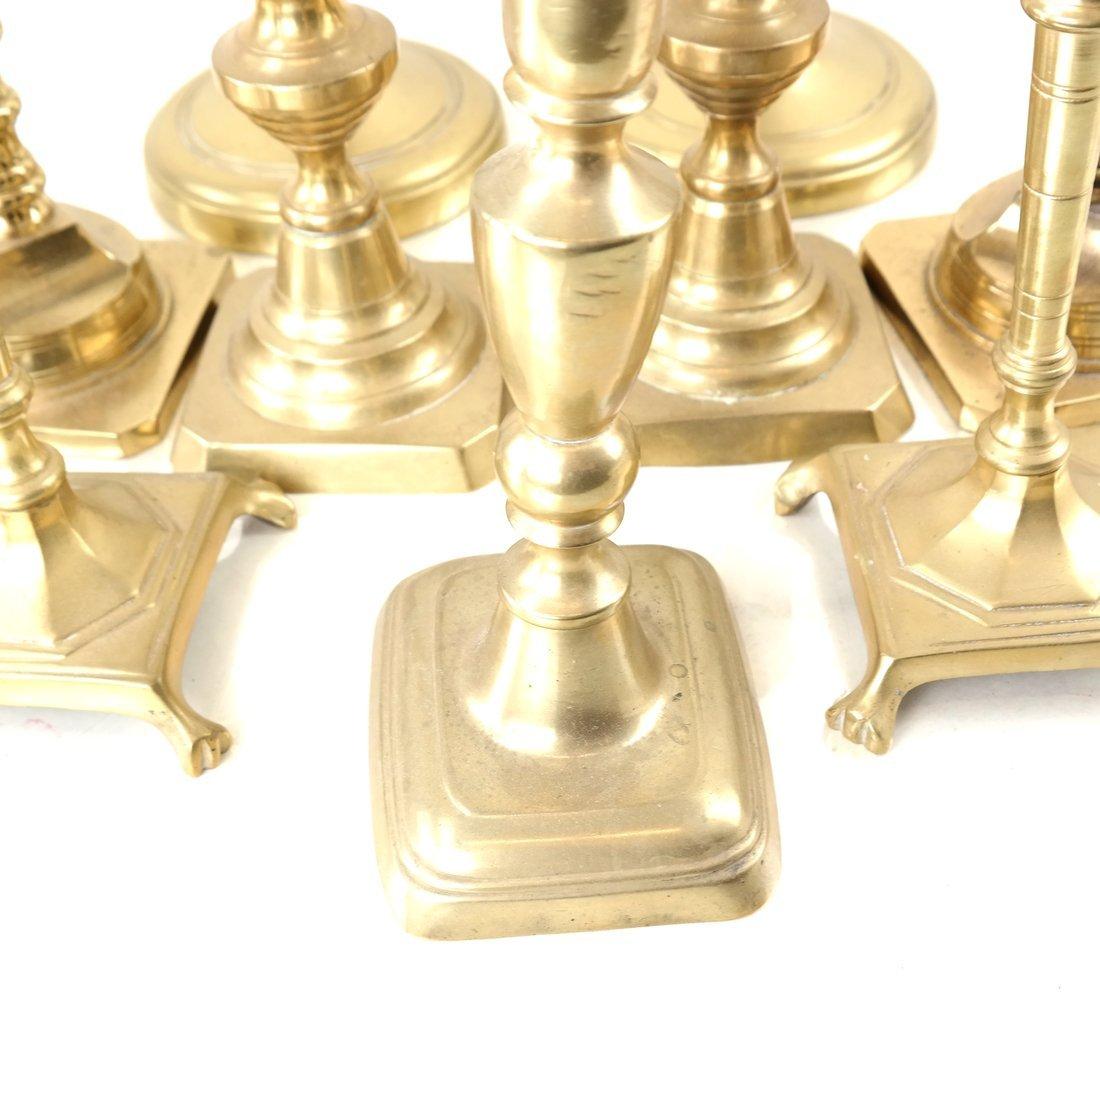 Nine Assorted Candlesticks - 5